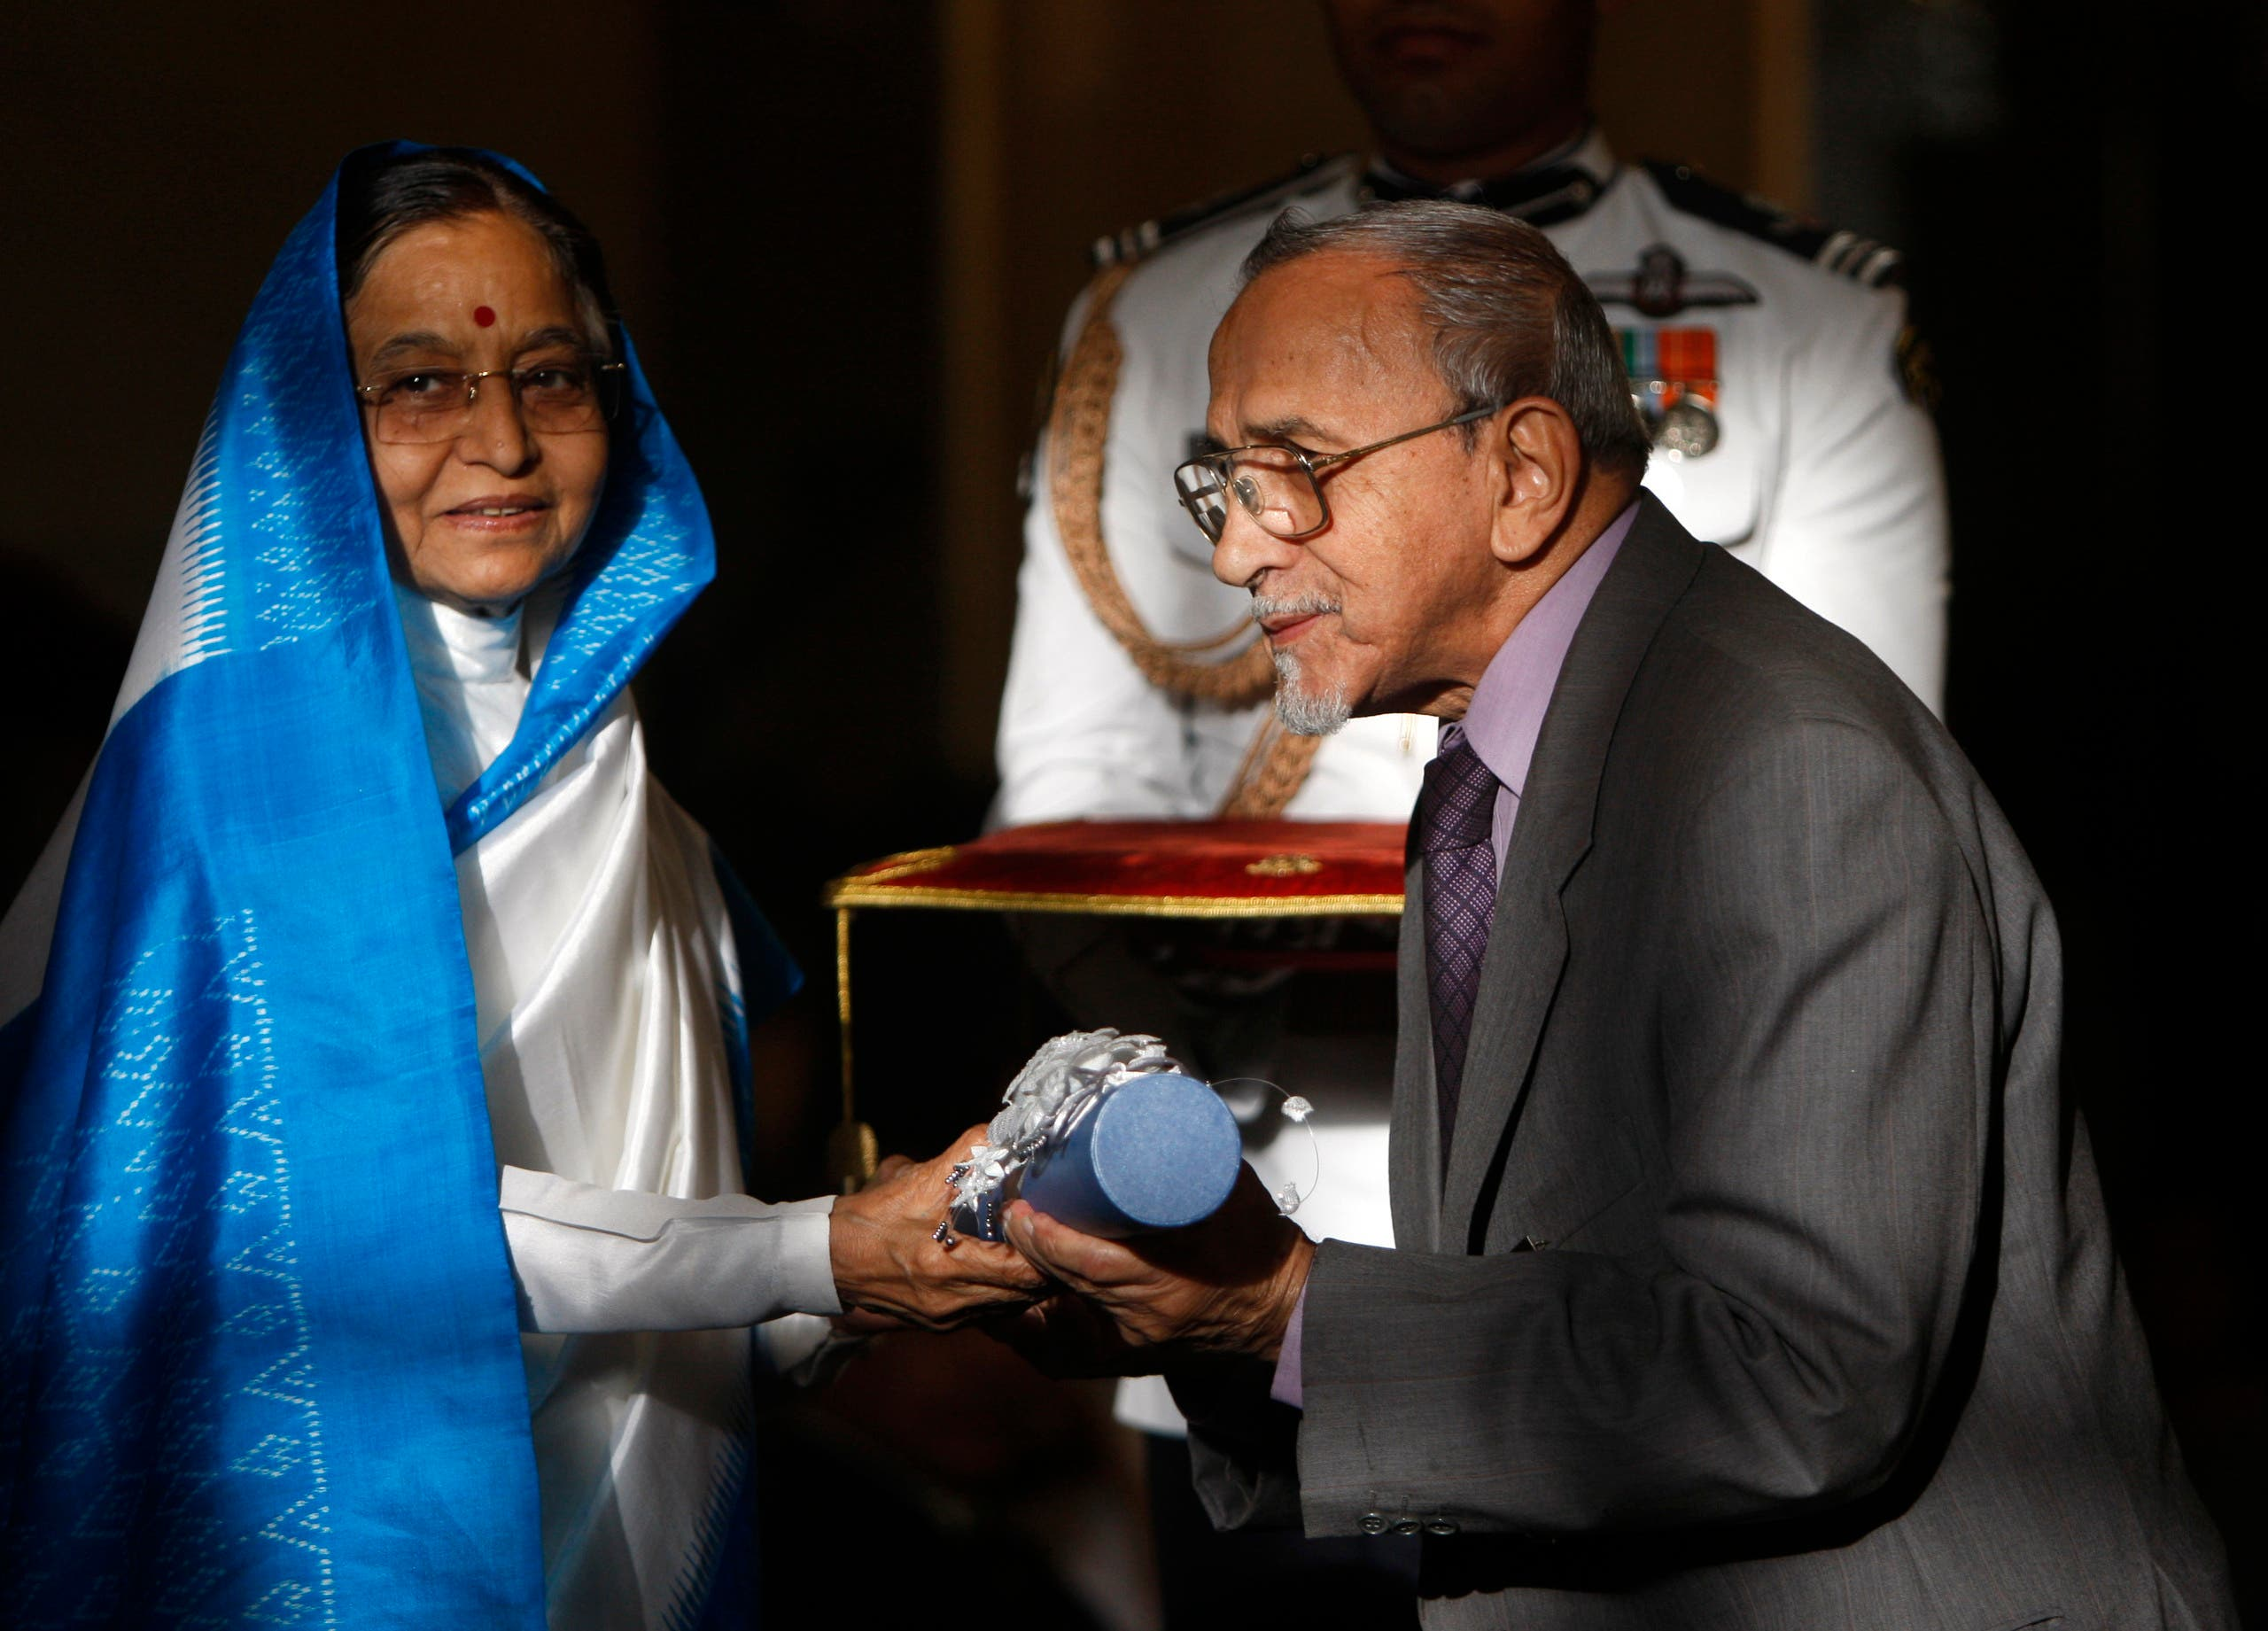 Indian President Pratibha Patil presents the Padma Vibhushan, one of India's highest civilian awards to theater director Ebrahim Hamed Alkazi in New Delhi on March 31, 2010. (AP)